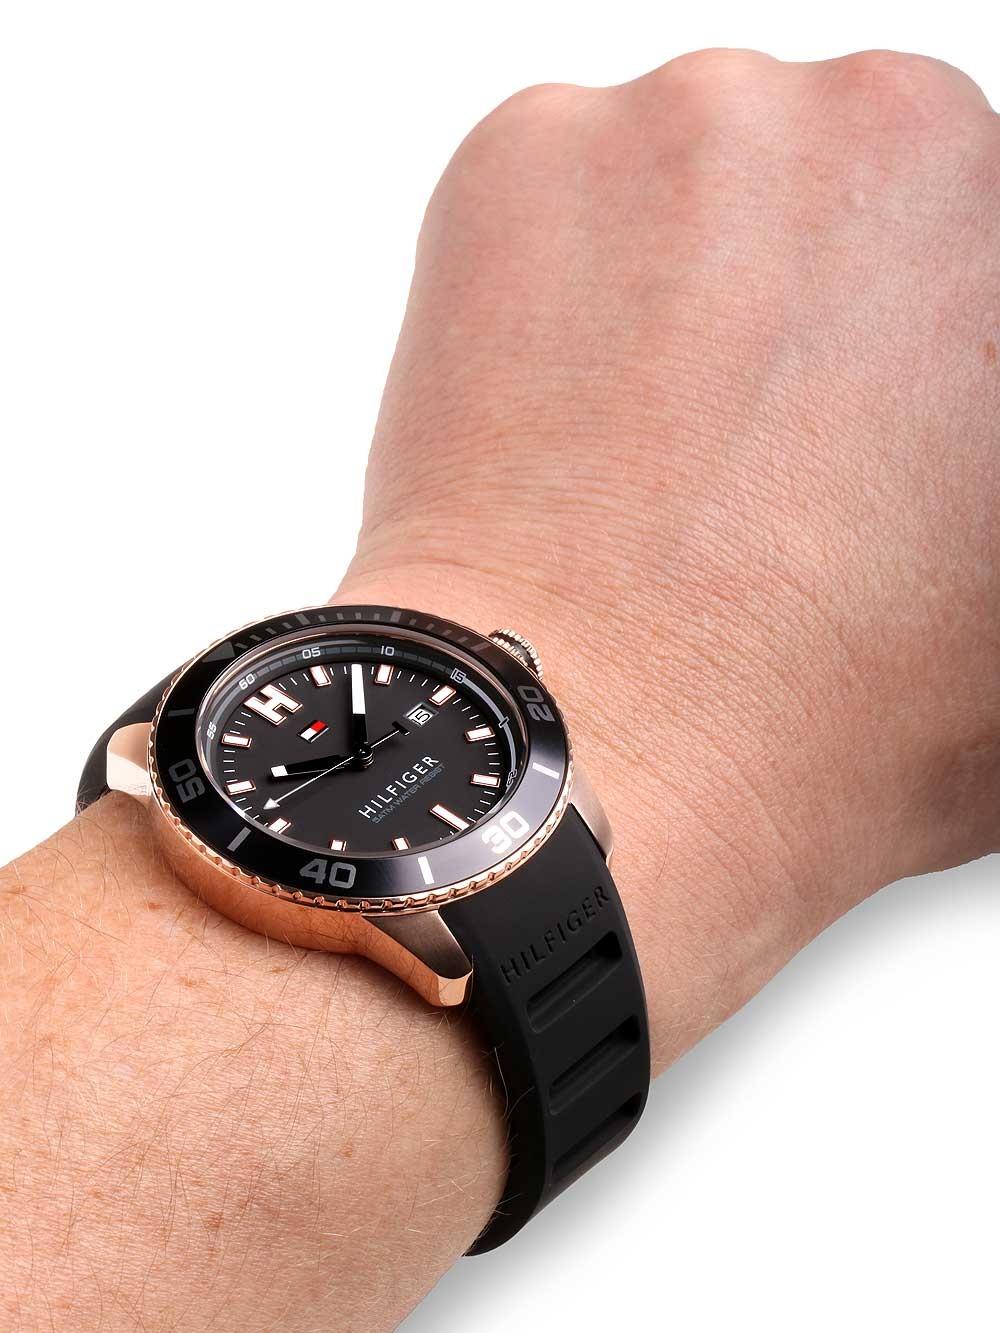 watches chrono12 tommy hilfiger 1791266 herrenuhr 46mm. Black Bedroom Furniture Sets. Home Design Ideas